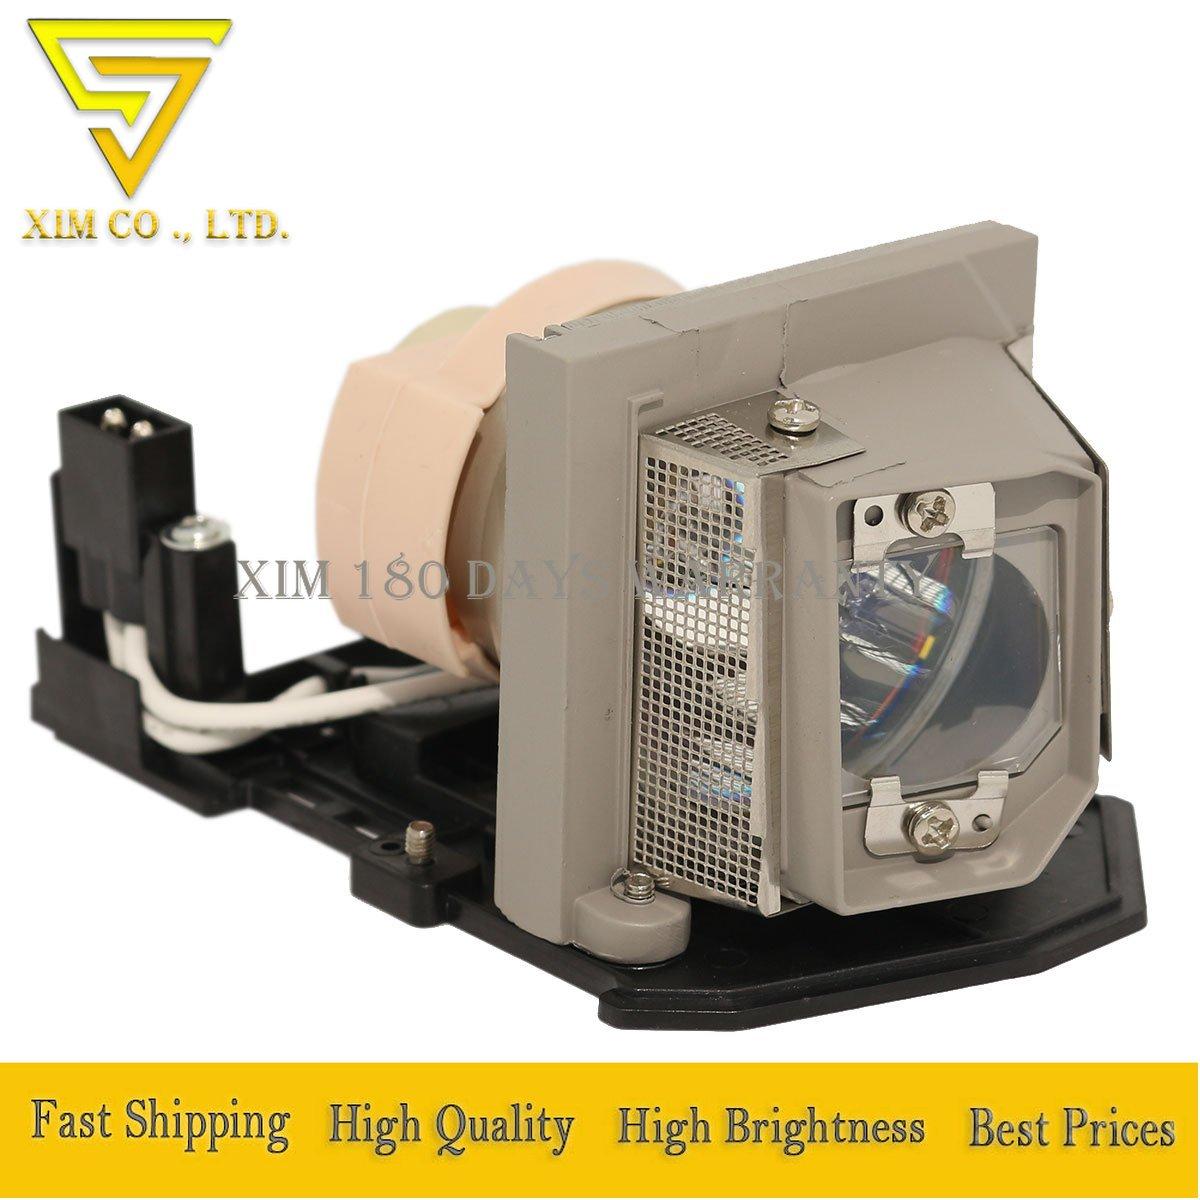 POA-LMP133/POA LMP133/CHSP8CS01GC01 проектор лампа/Лампа для проектора SANYO PDG-DSU30 PDG-DSU300 PDG-DSU3000C PDG-DSU30N PDGDSU30